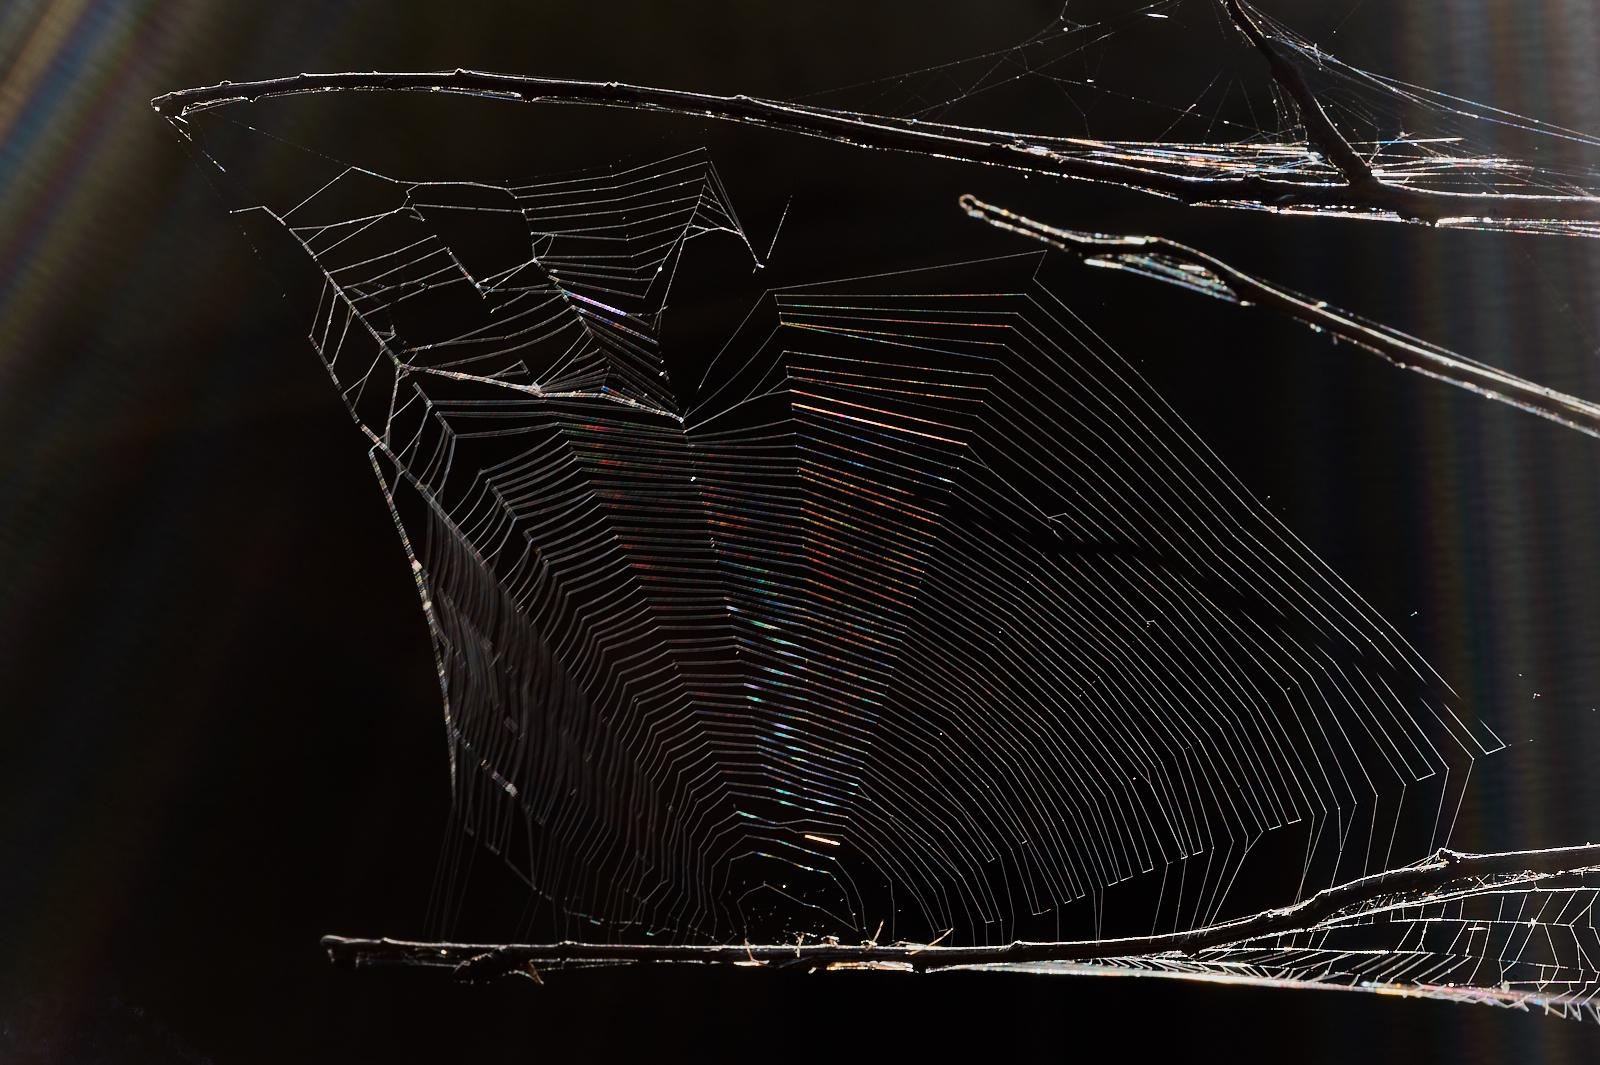 spiders web, rainbow,prism,Philippines